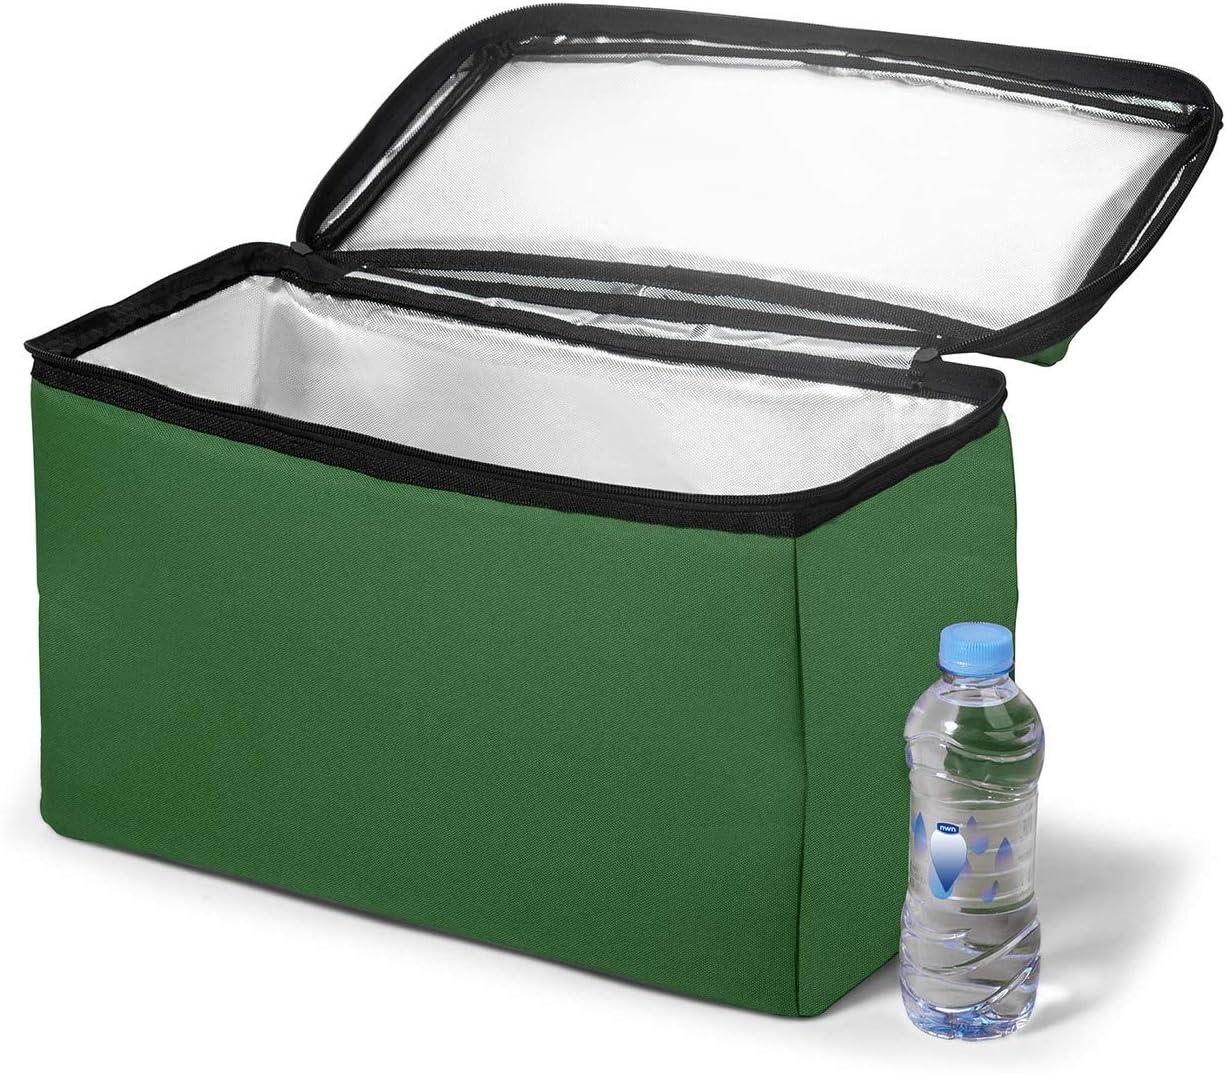 SAMAX Nevera port/átil para Plegable Carrito de Offroad 42x19x24 cm Bolsa T/érmica Almacenamiento Verde